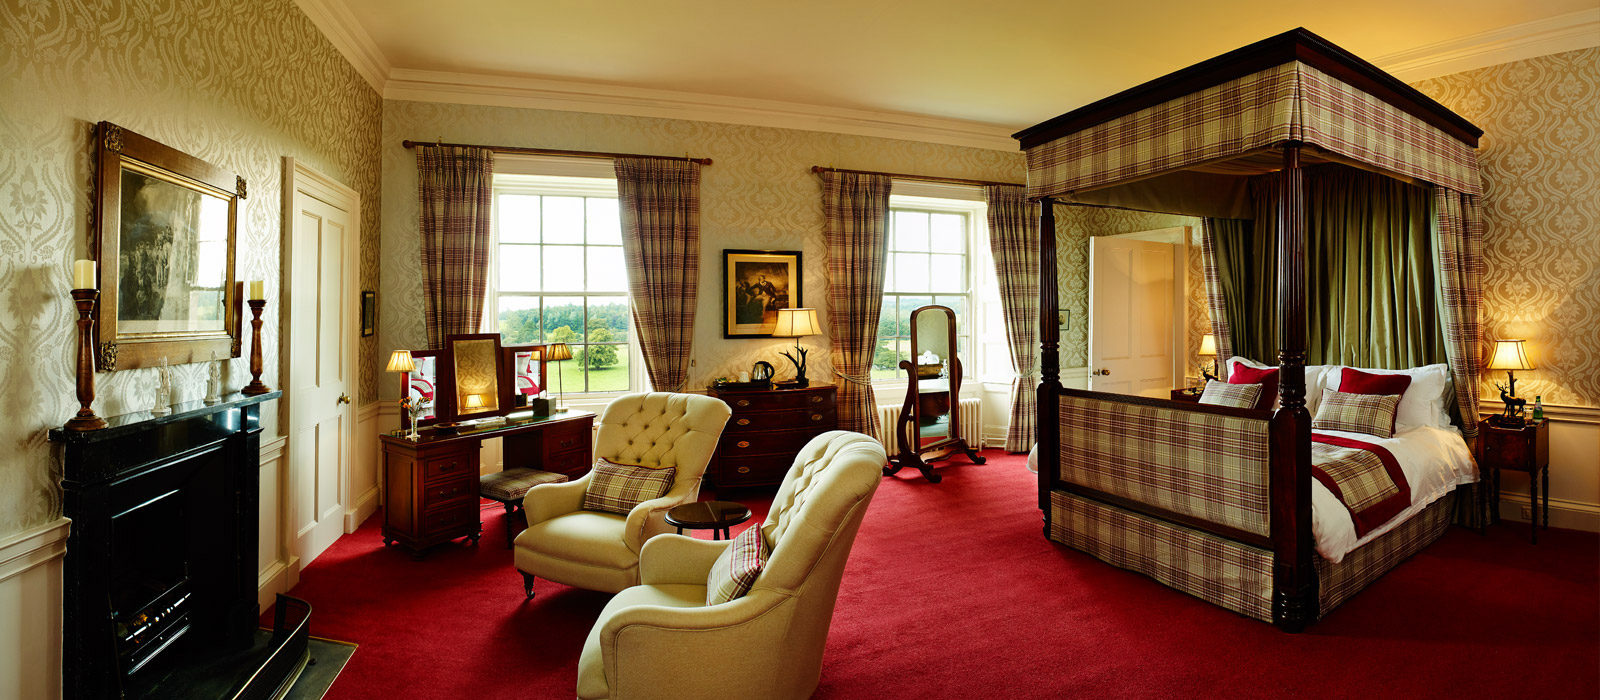 Grand room 2